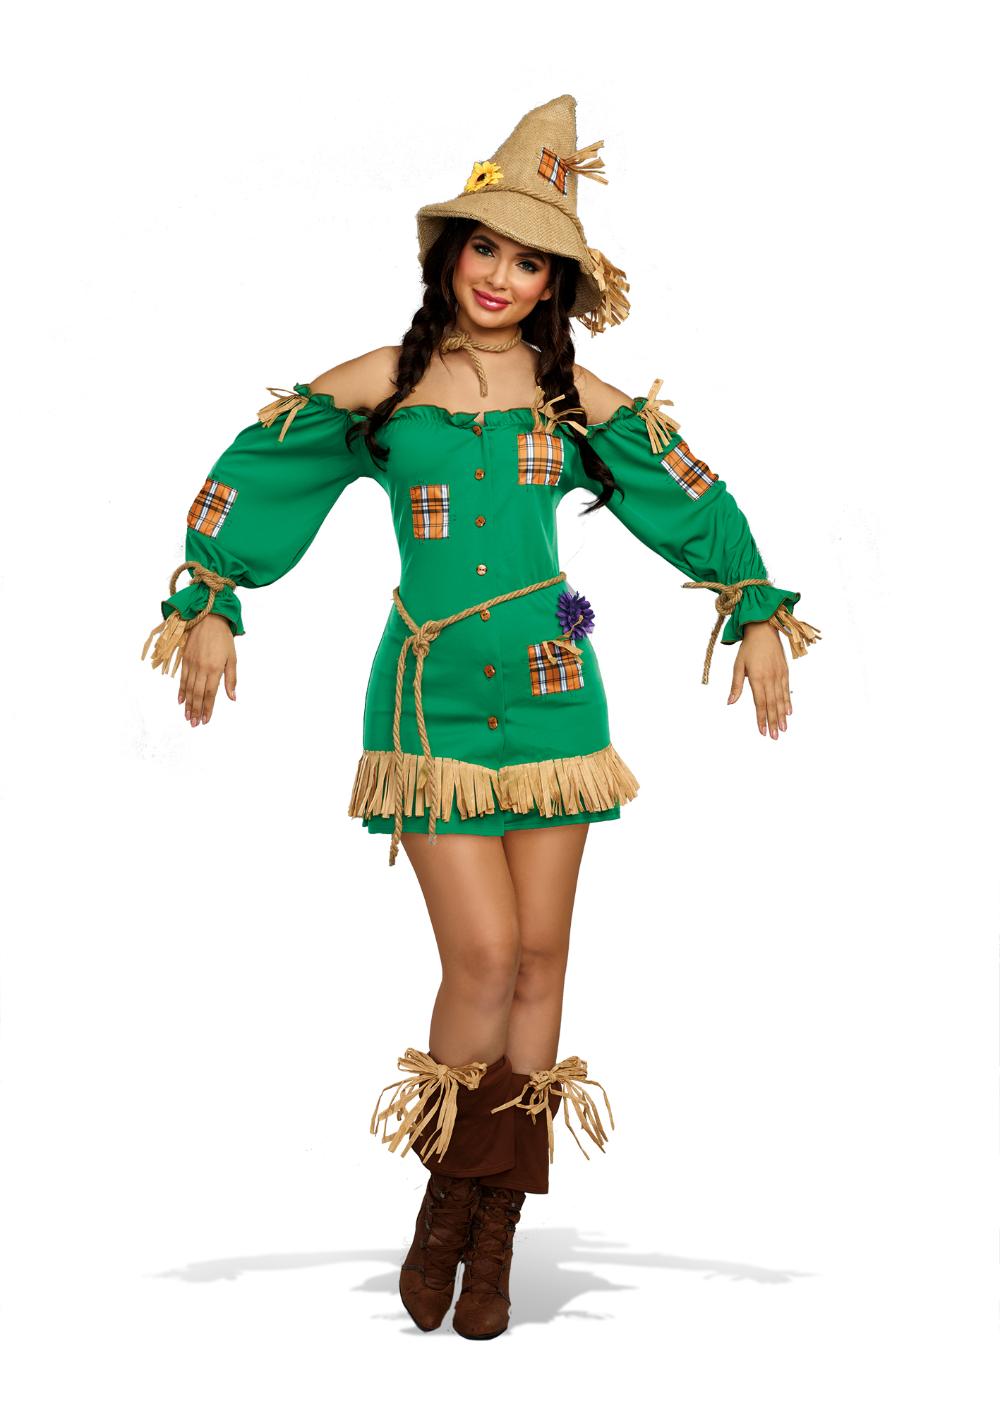 Scarecrow Women's Costume in 2020 Scarecrow costume